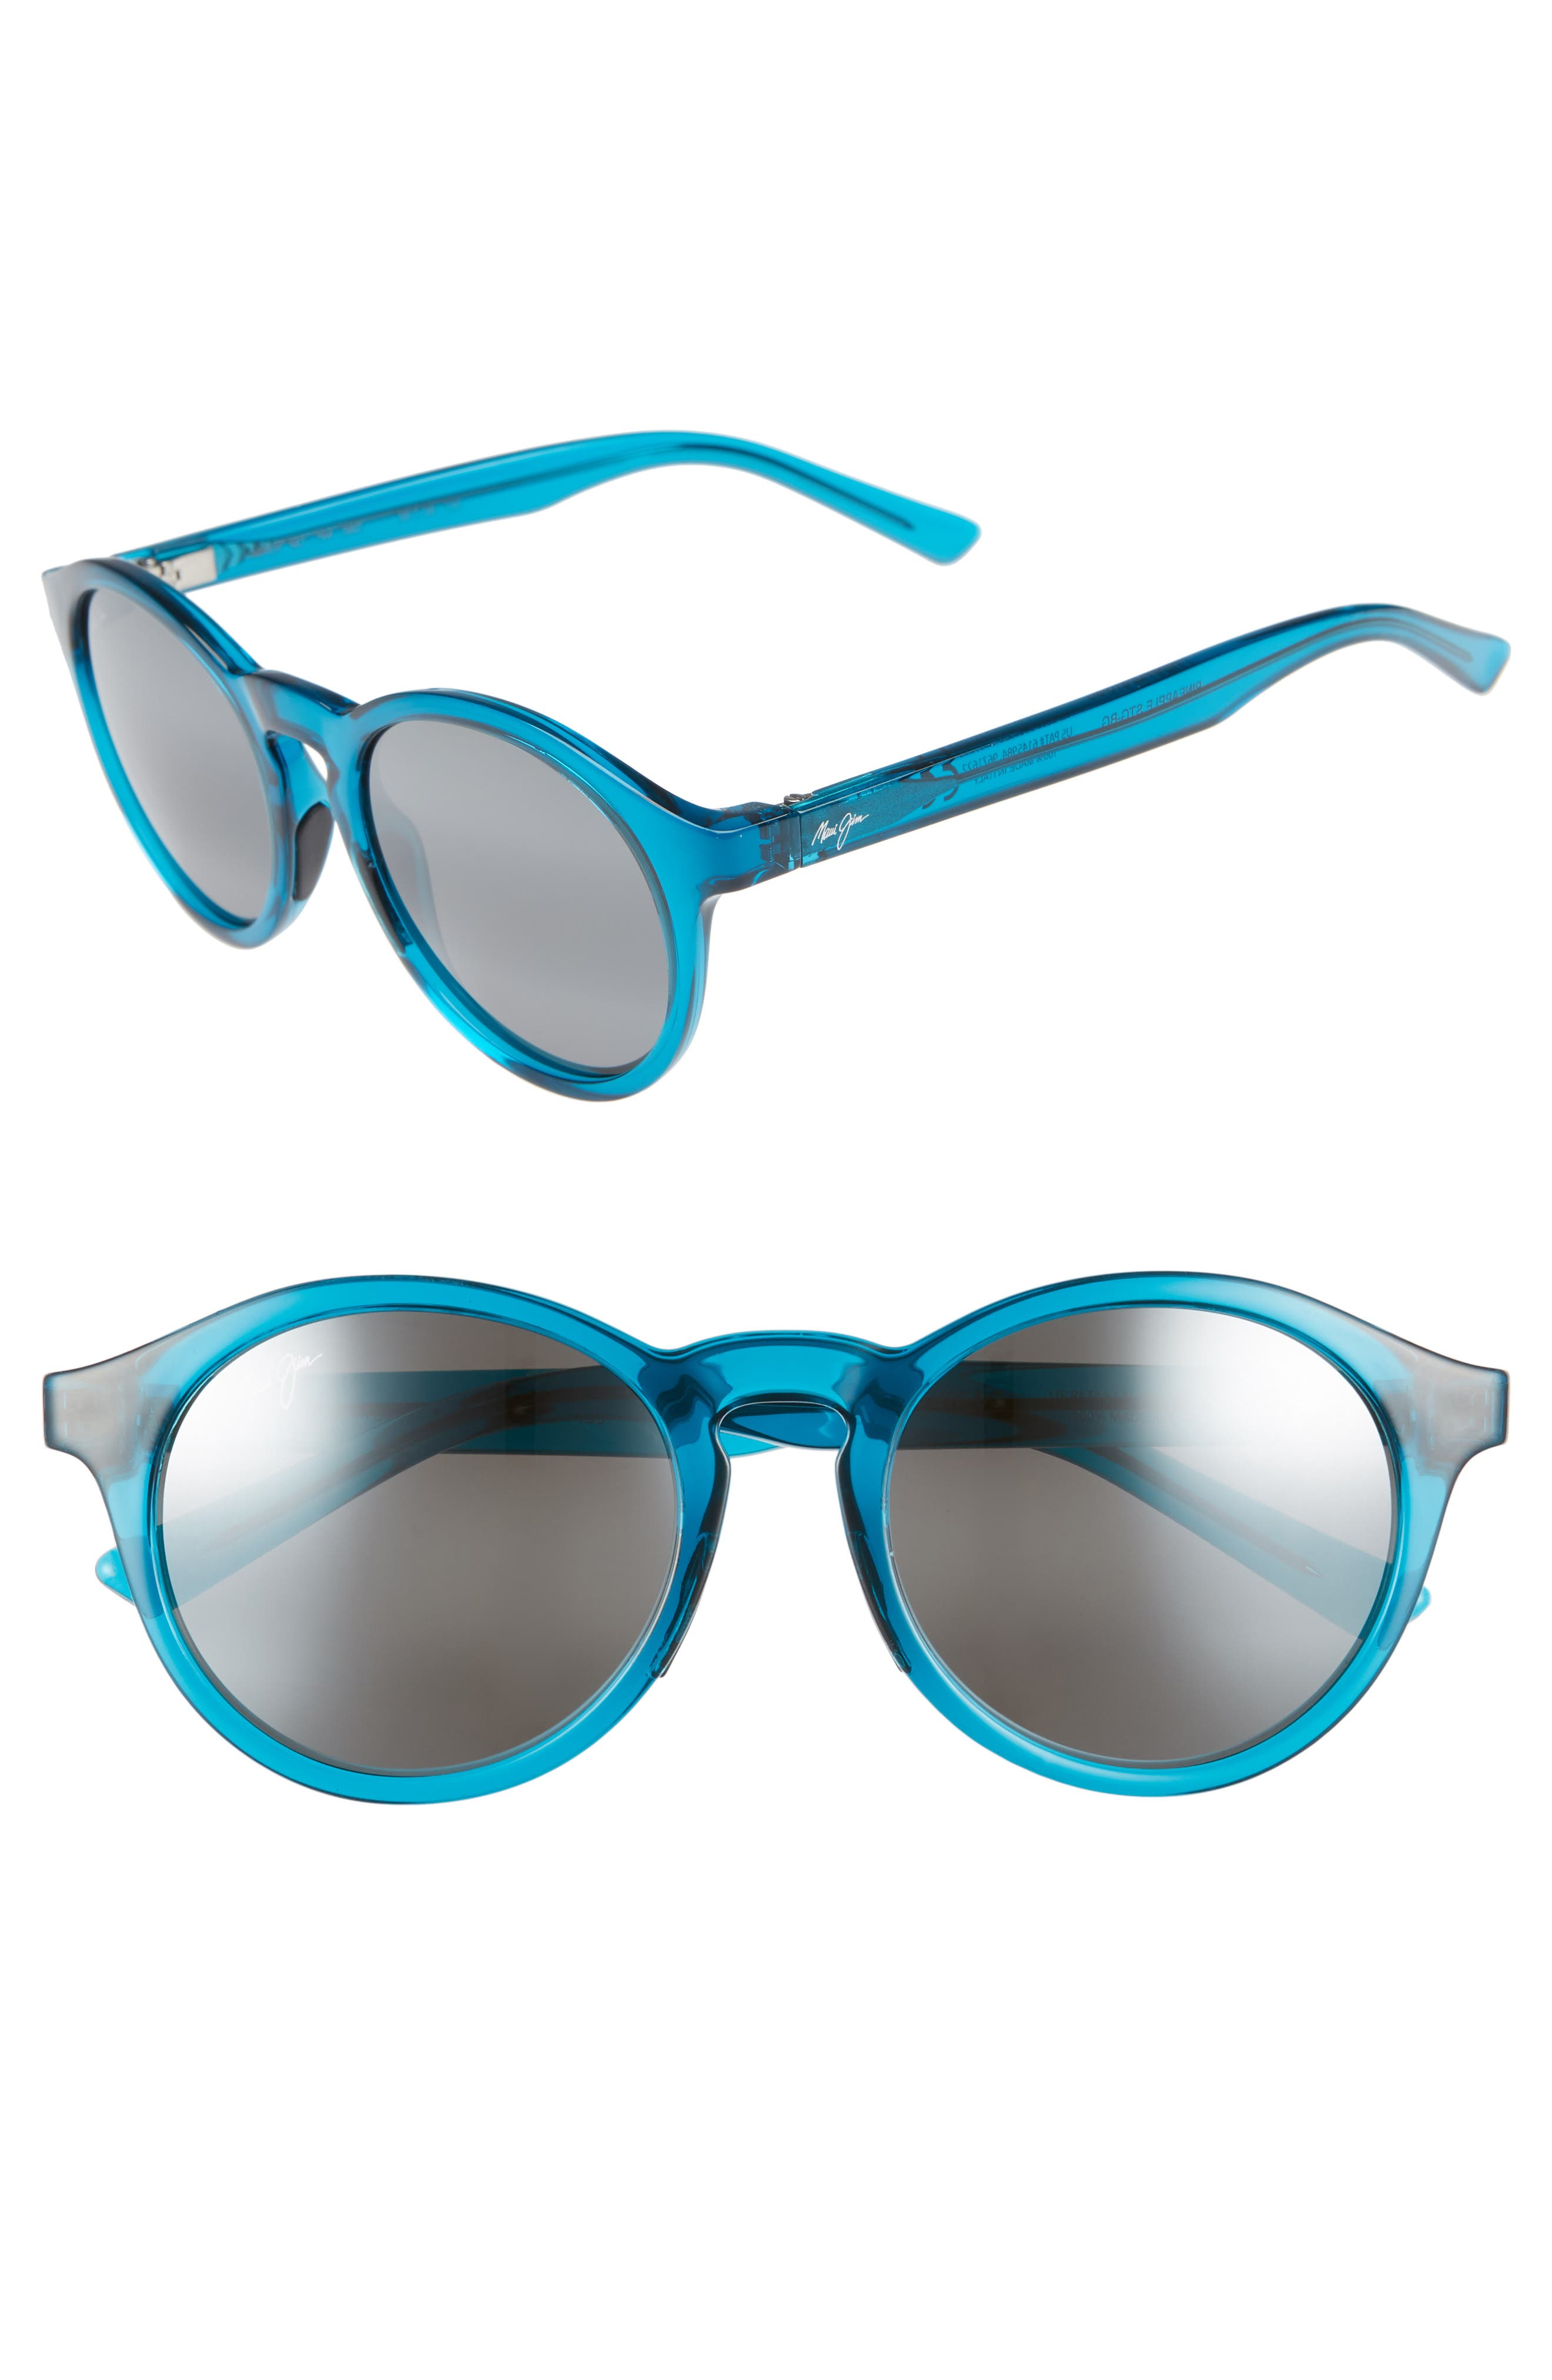 Maui Jim Pineapple 50Mm Polarized Round Sunglasses - Teal Green